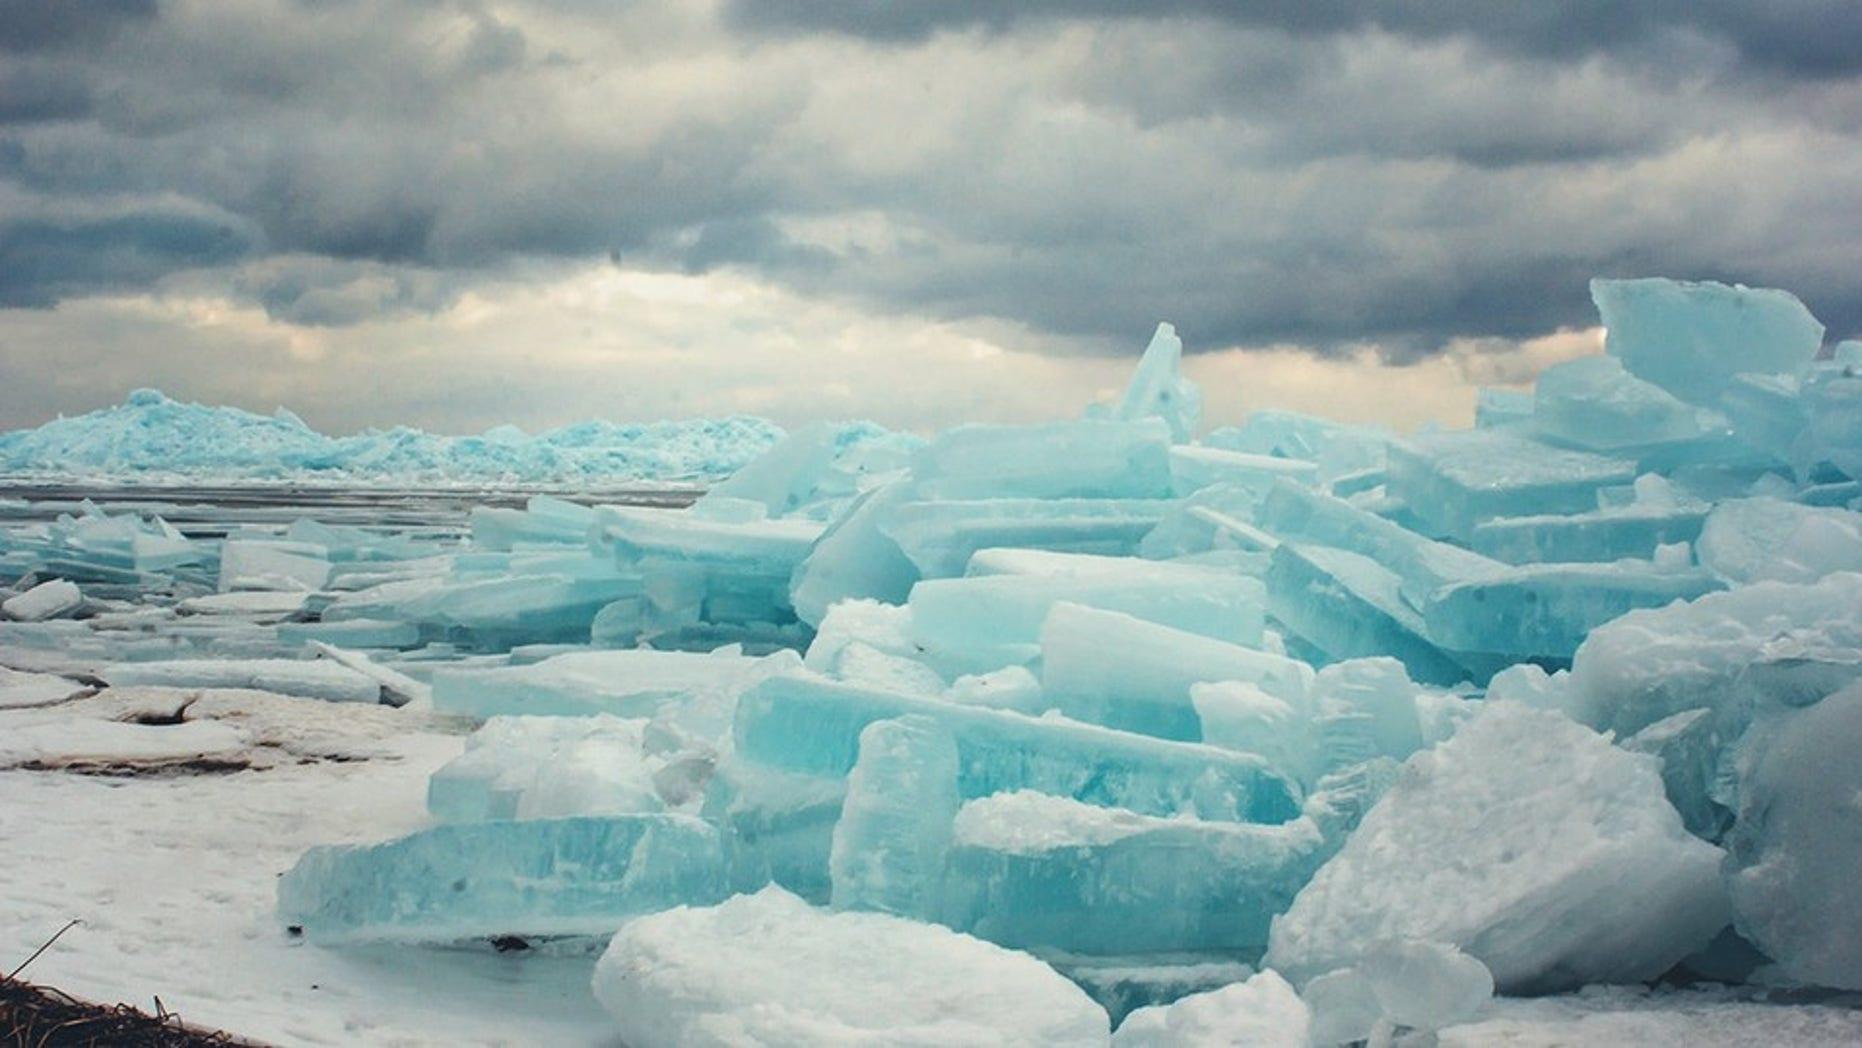 Photographer Tori Burley captures a stunning photo of blue ice forming under the Mackinac Bridge in Michigan.